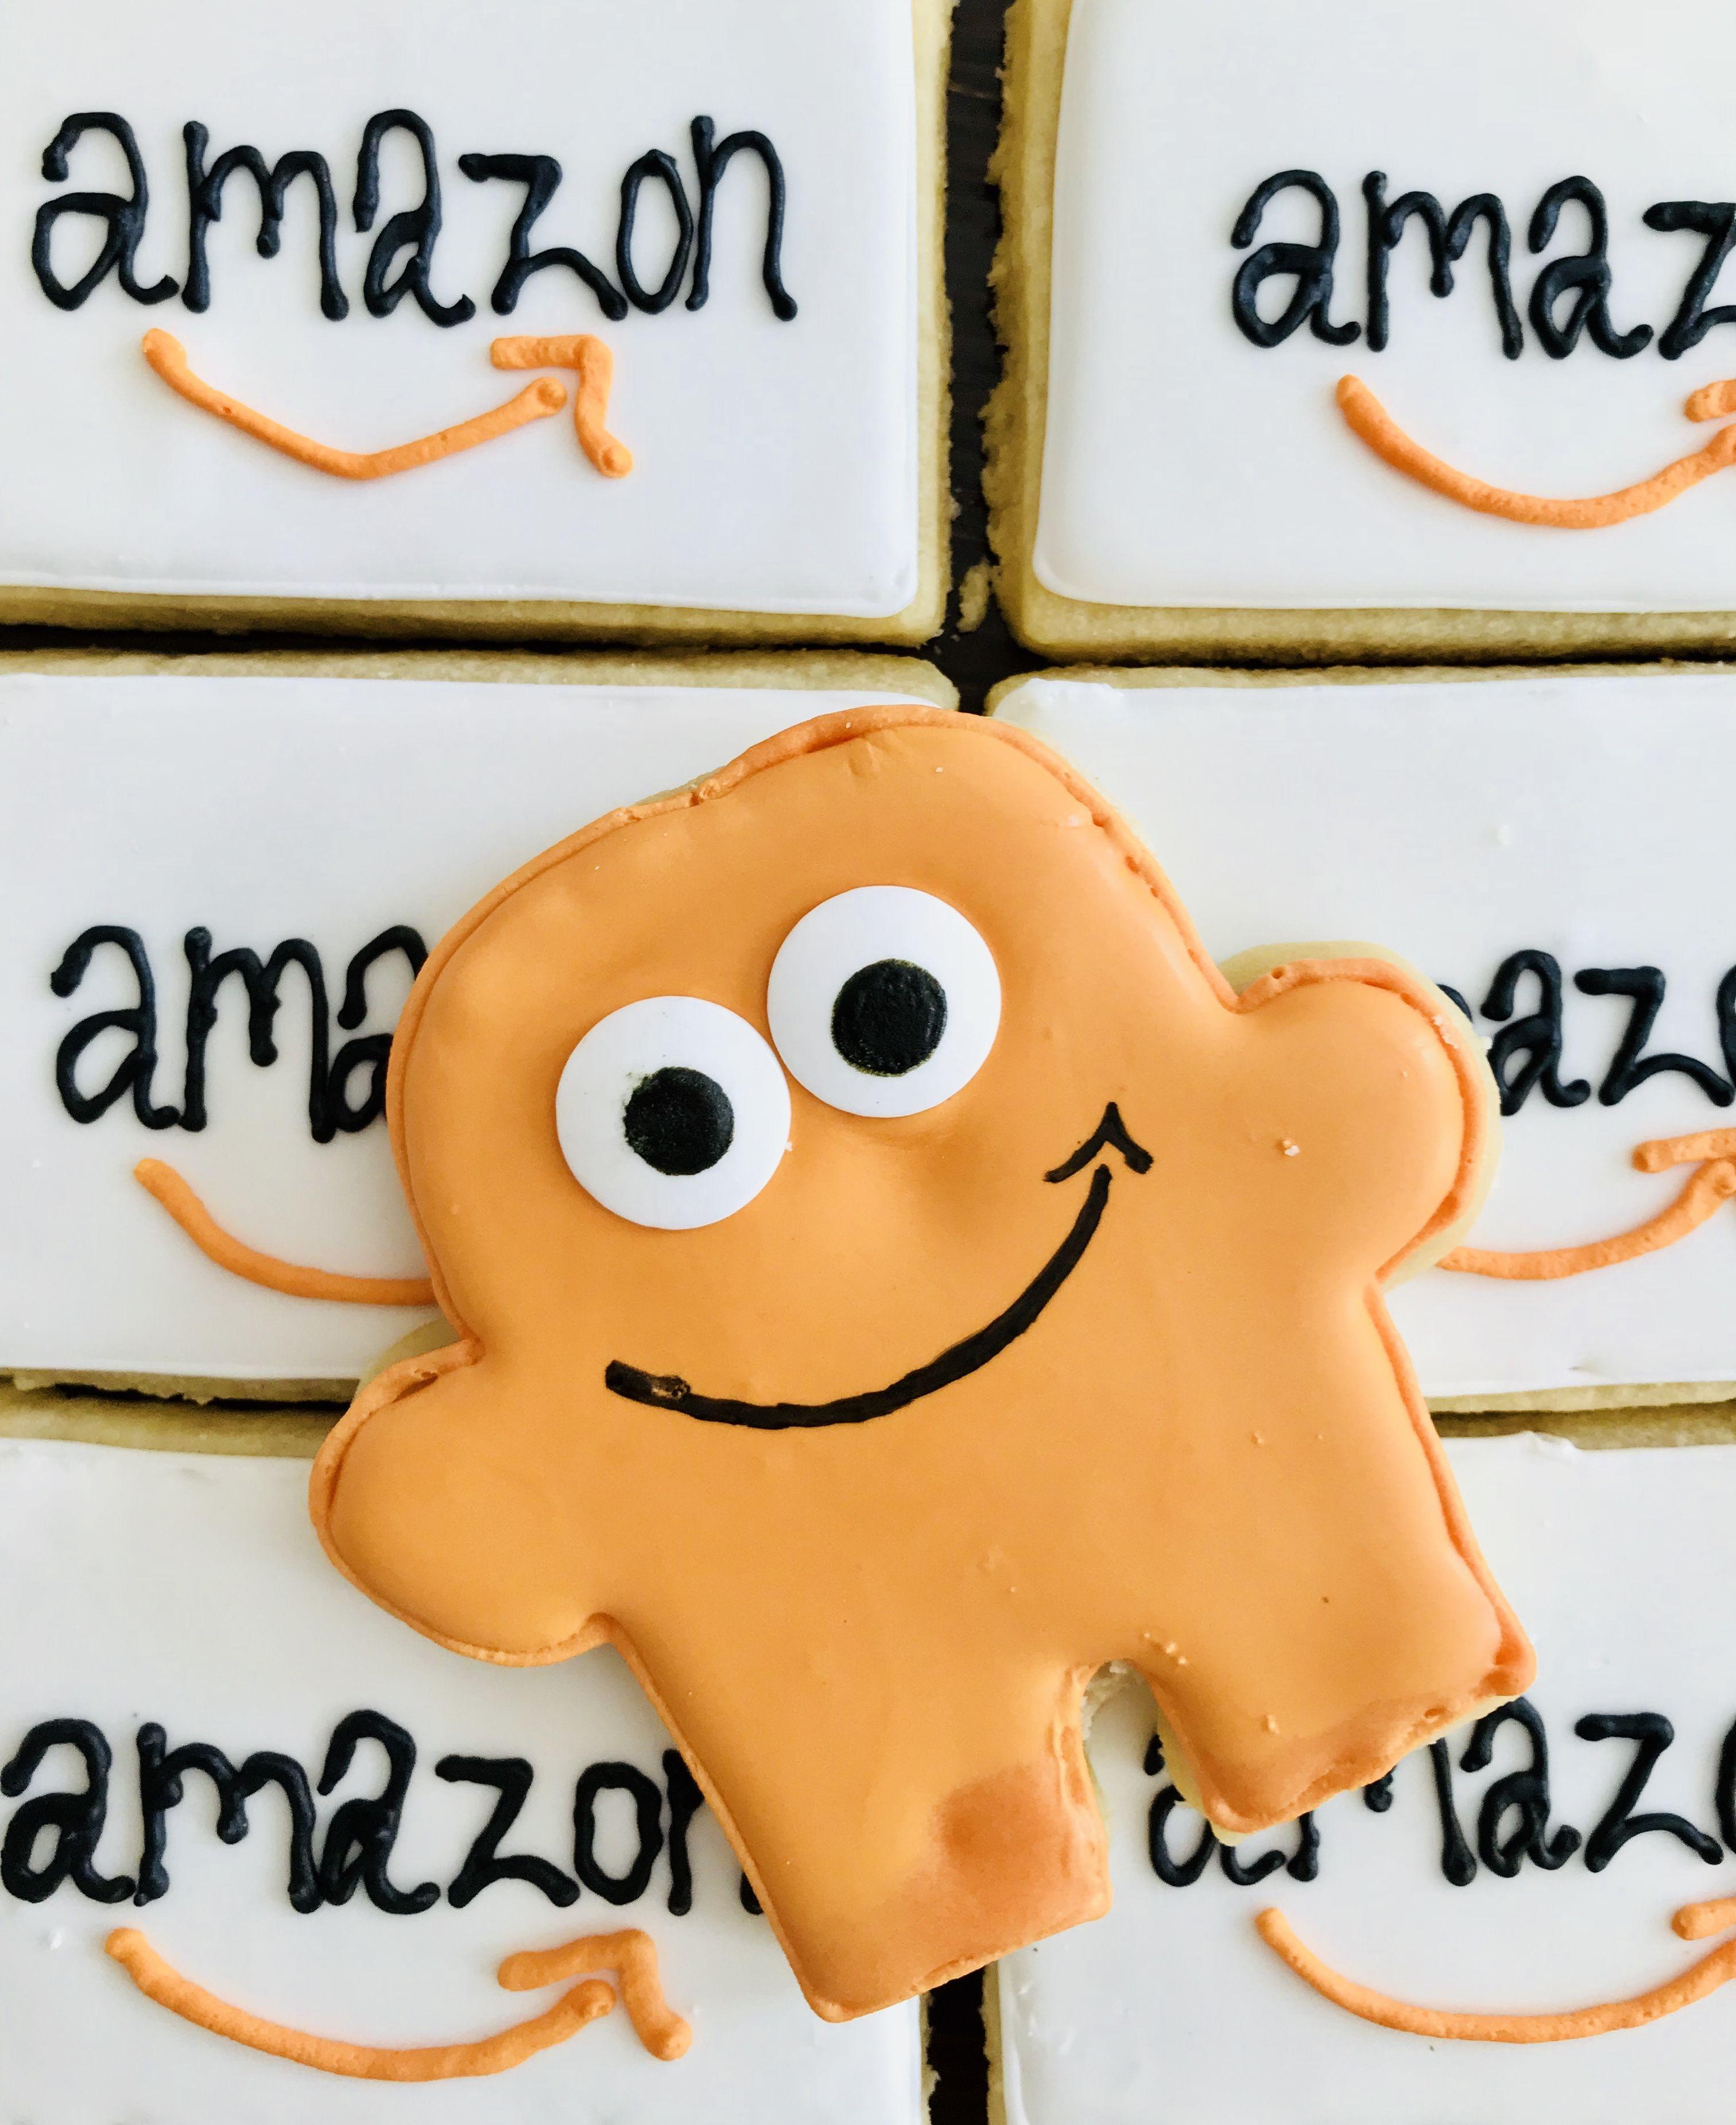 Amazon's mascot, Peccy  Isn't he the cutest little sugar